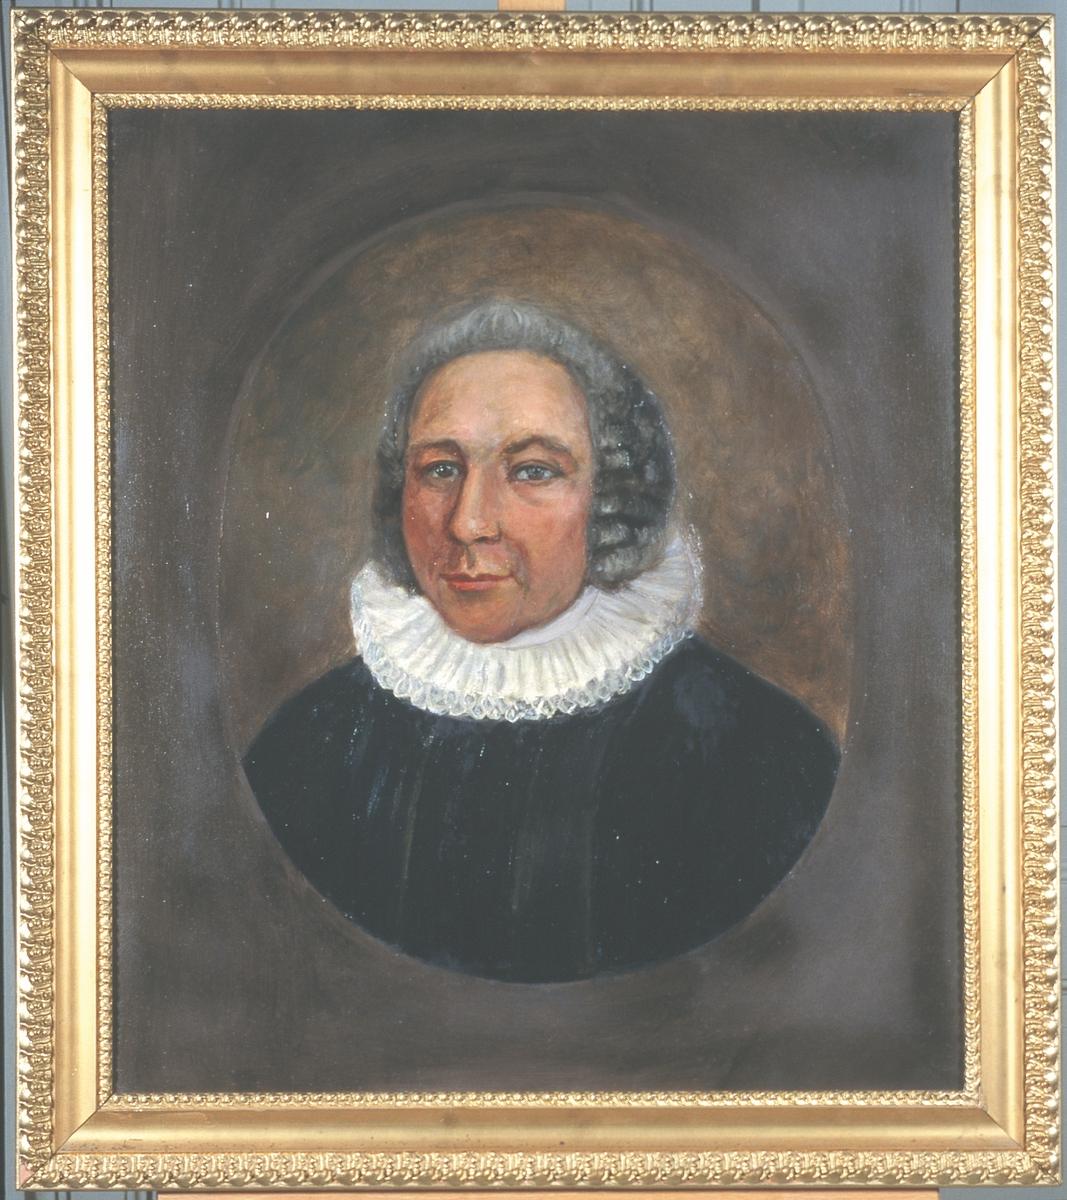 Darre, Jacob Hersleb (1757 - 1841)